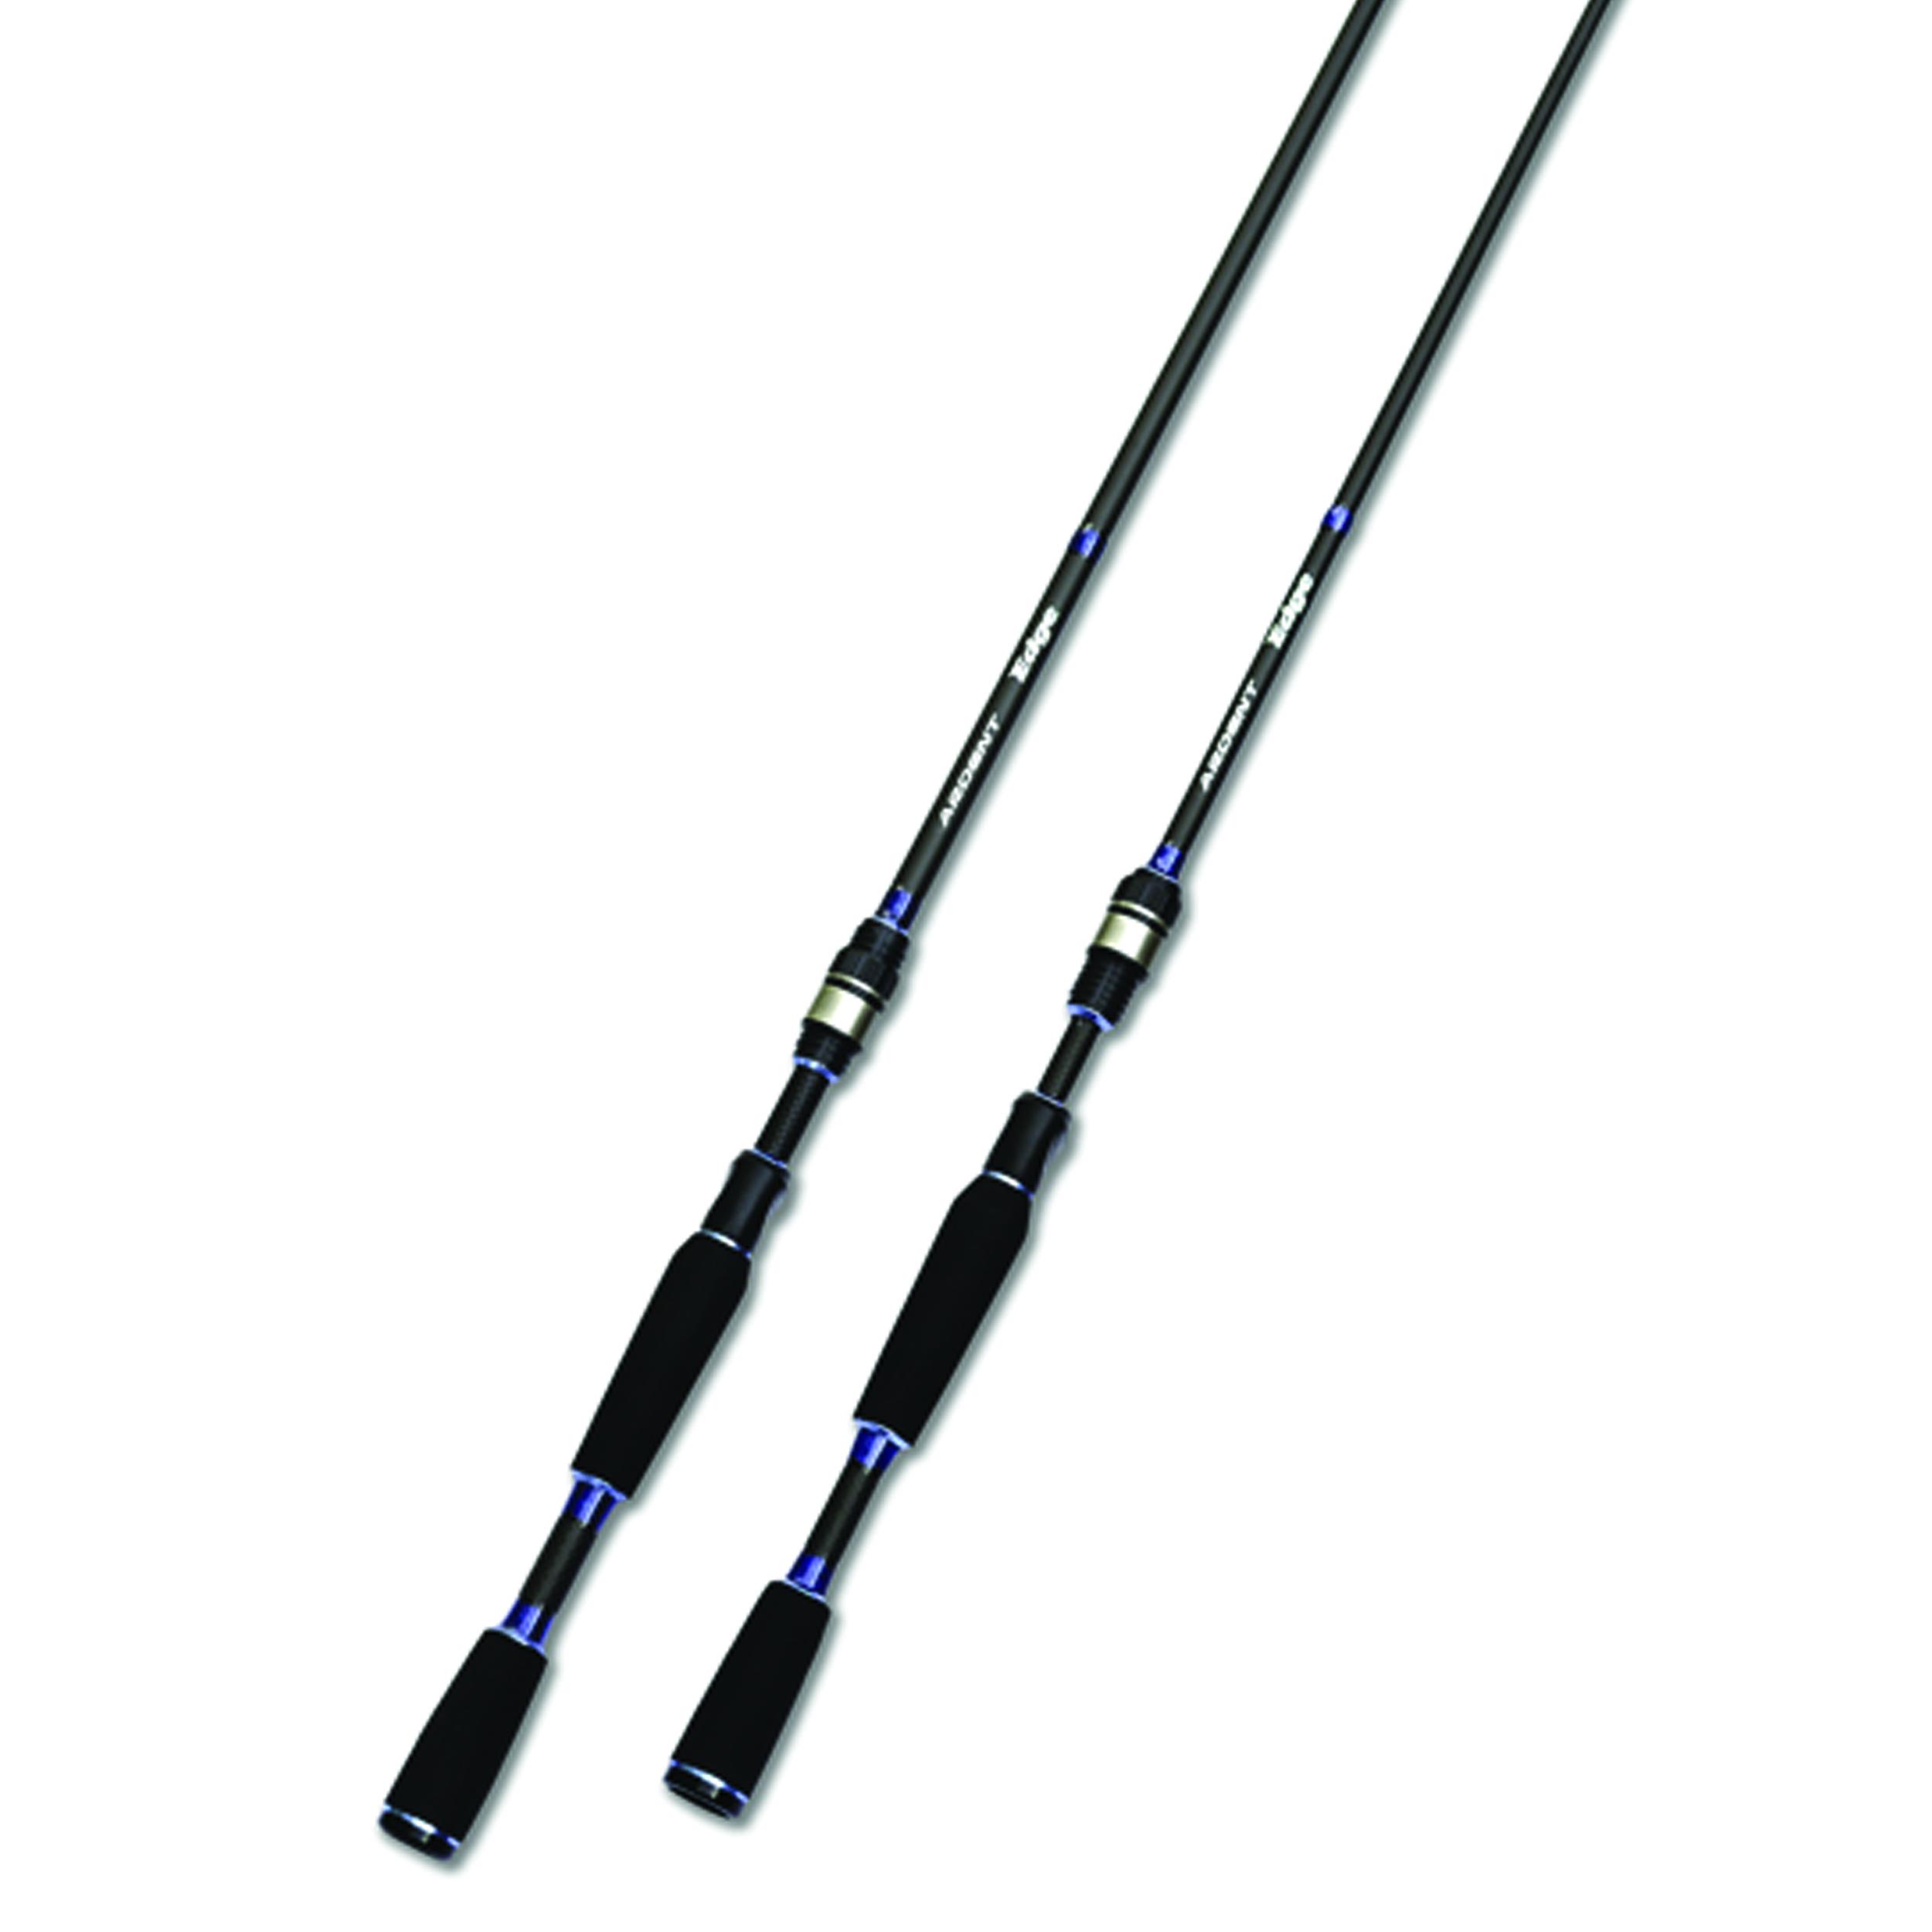 Ardent Edge Fishing Rod